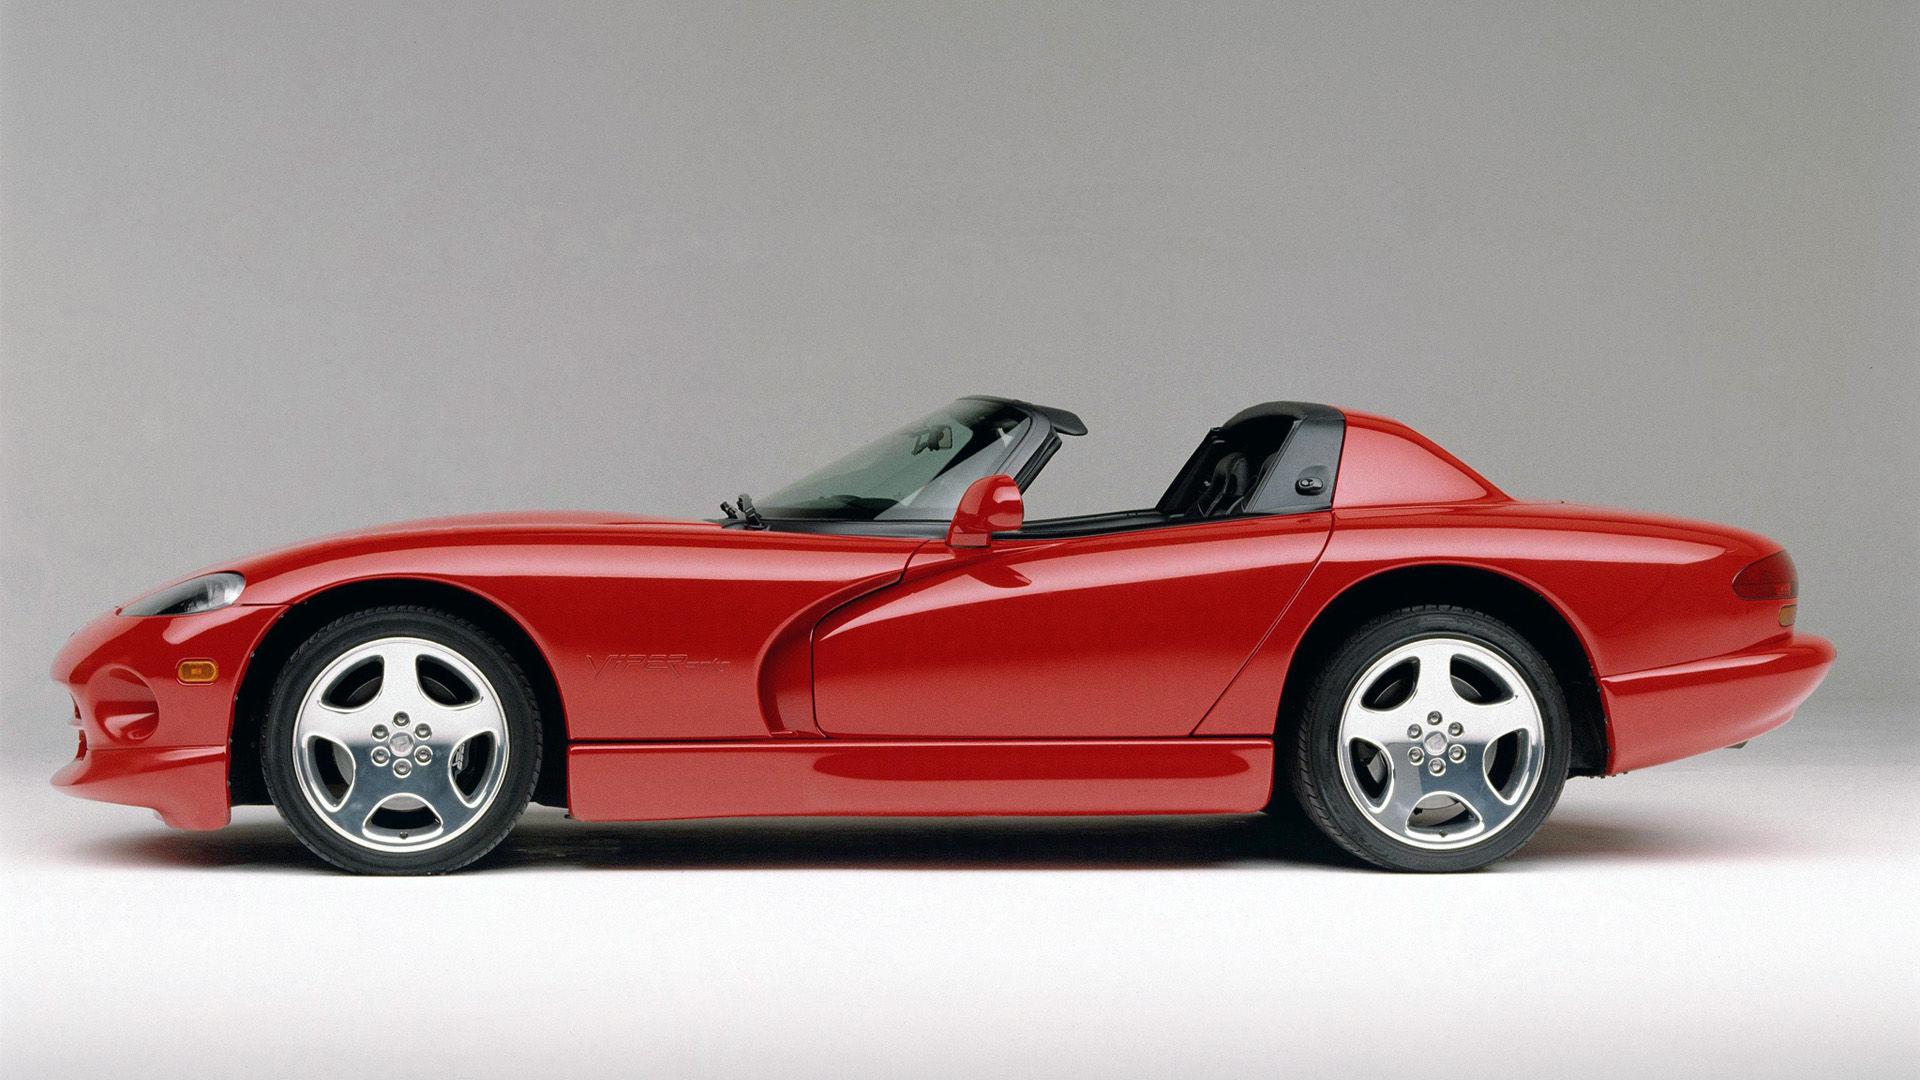 1996 Dodge Viper RT10 Roadster